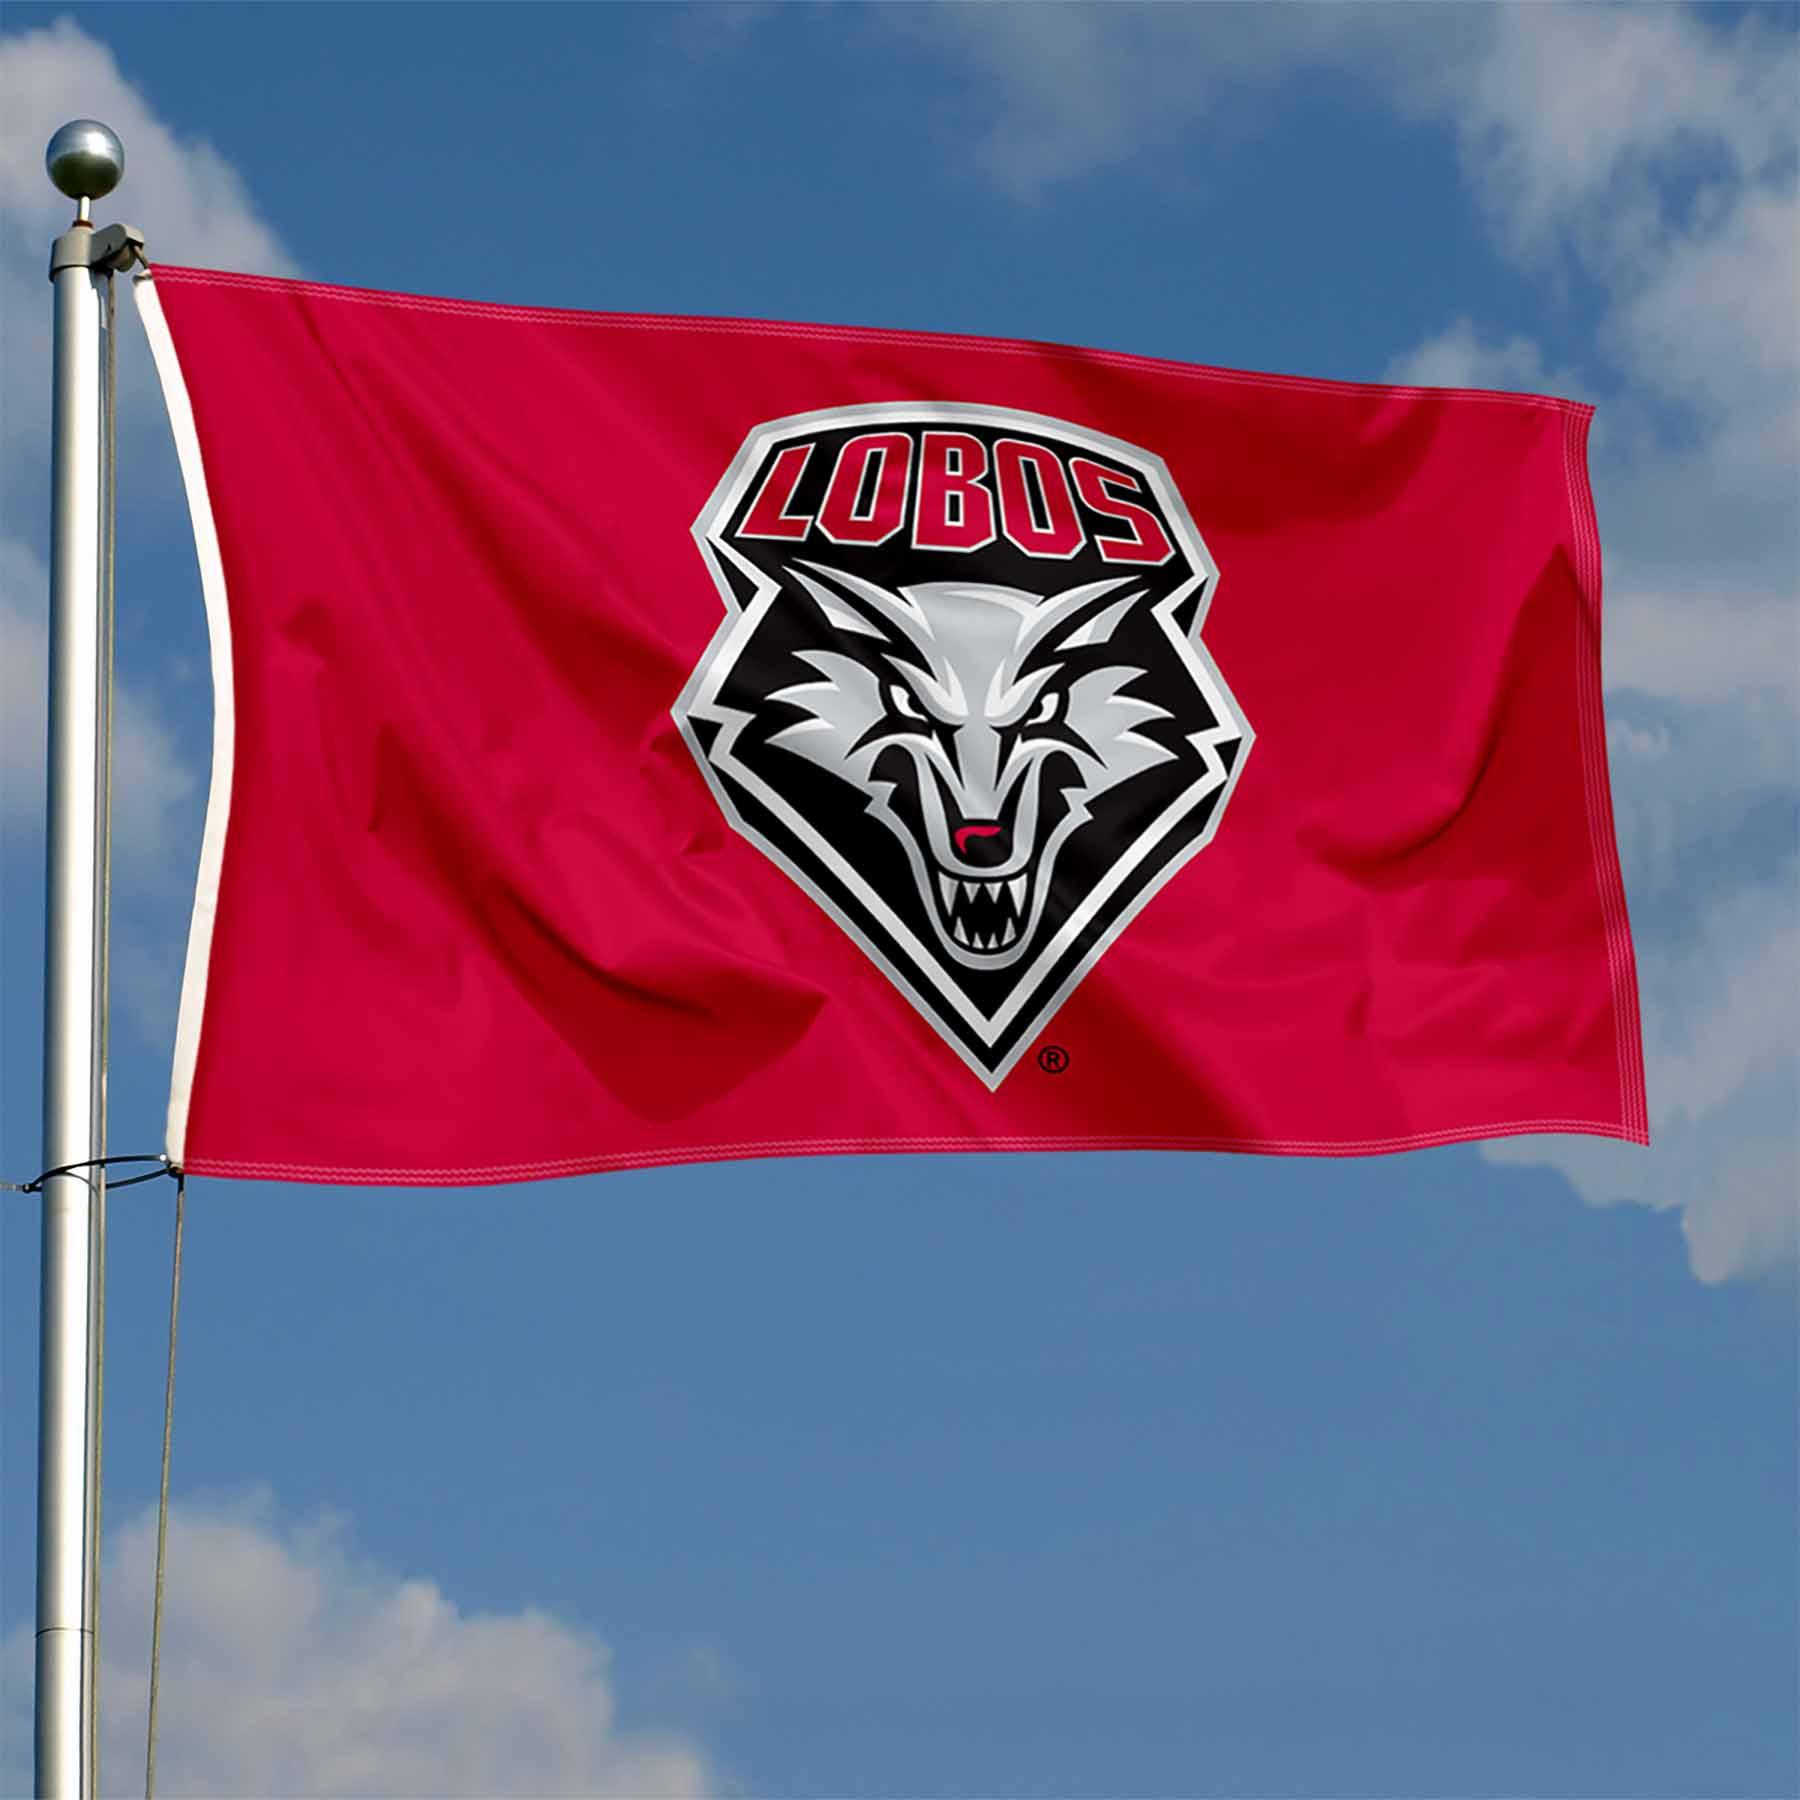 University of New Mexico Lobos Flag UNM Large 3x5